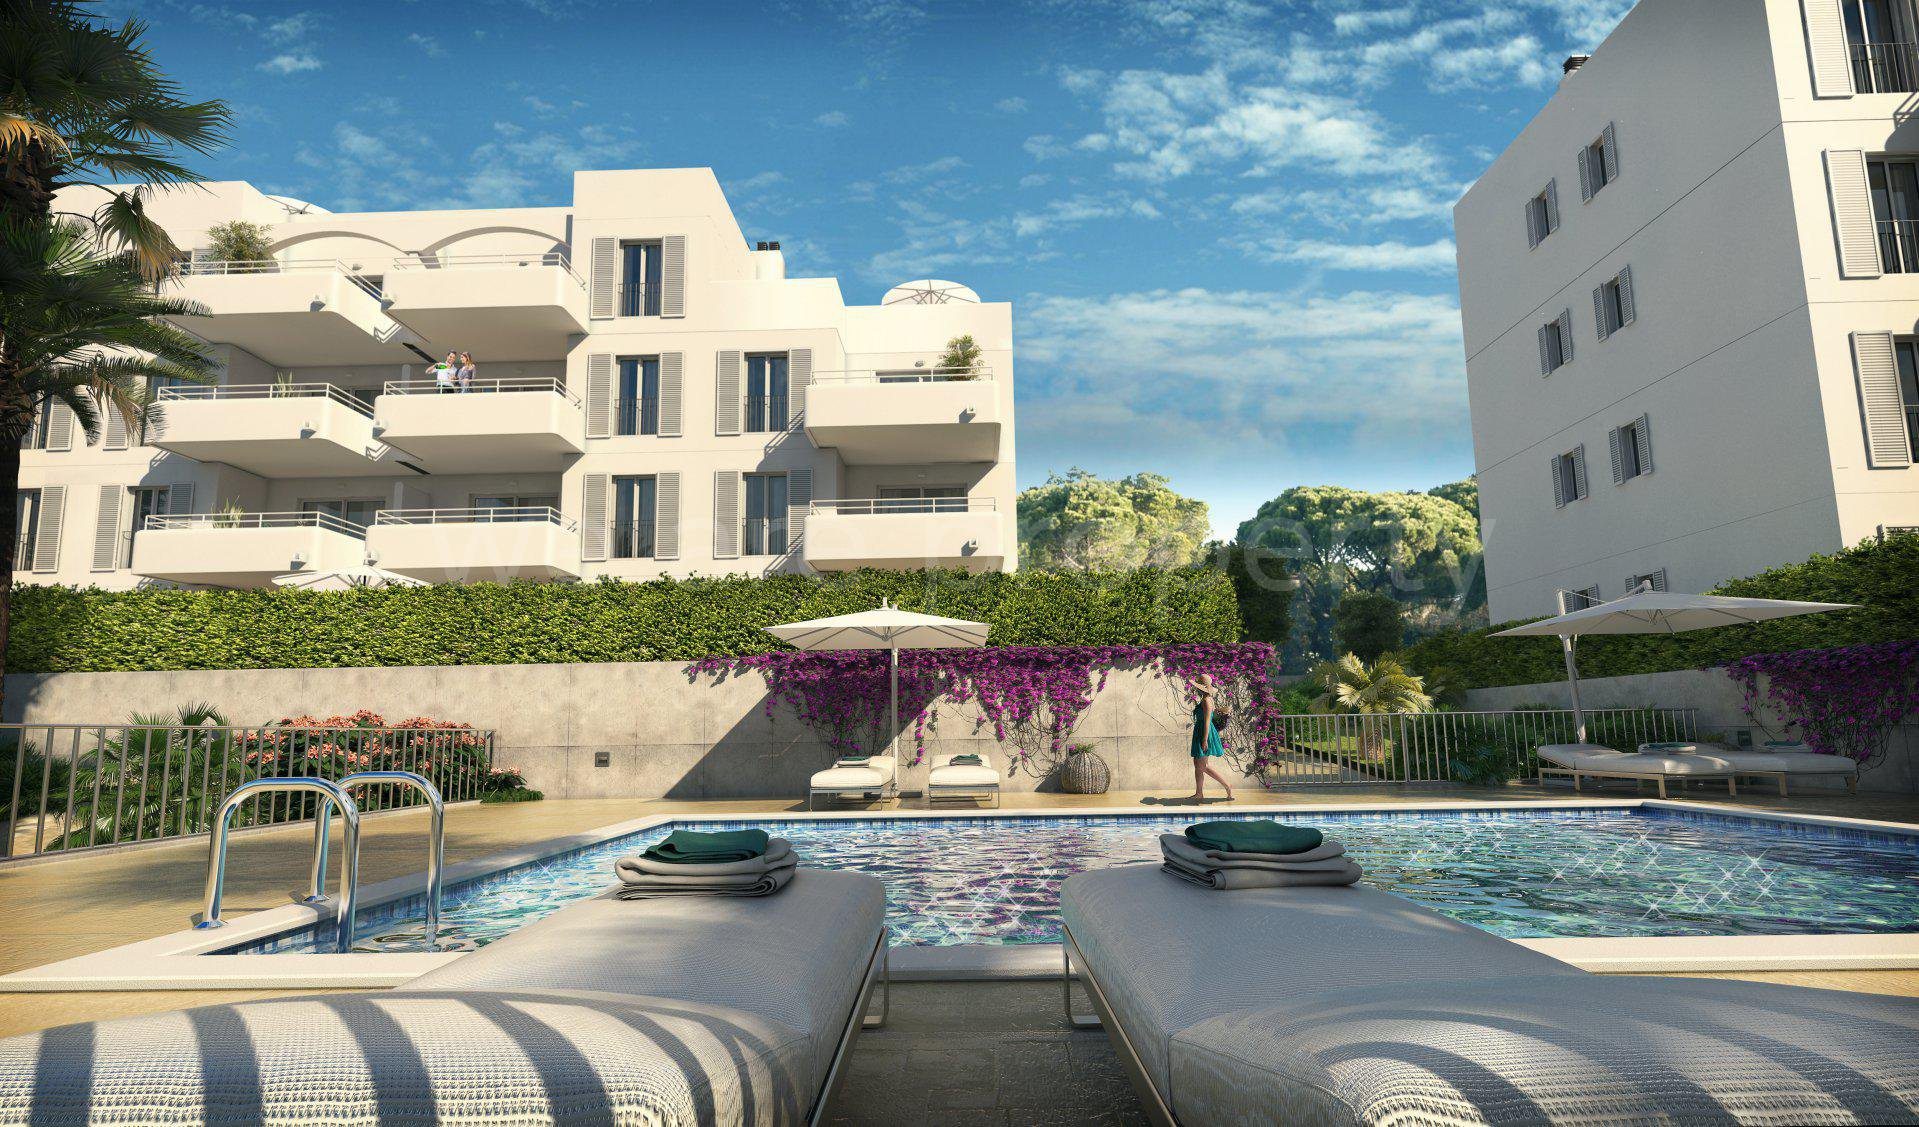 New built penthouses